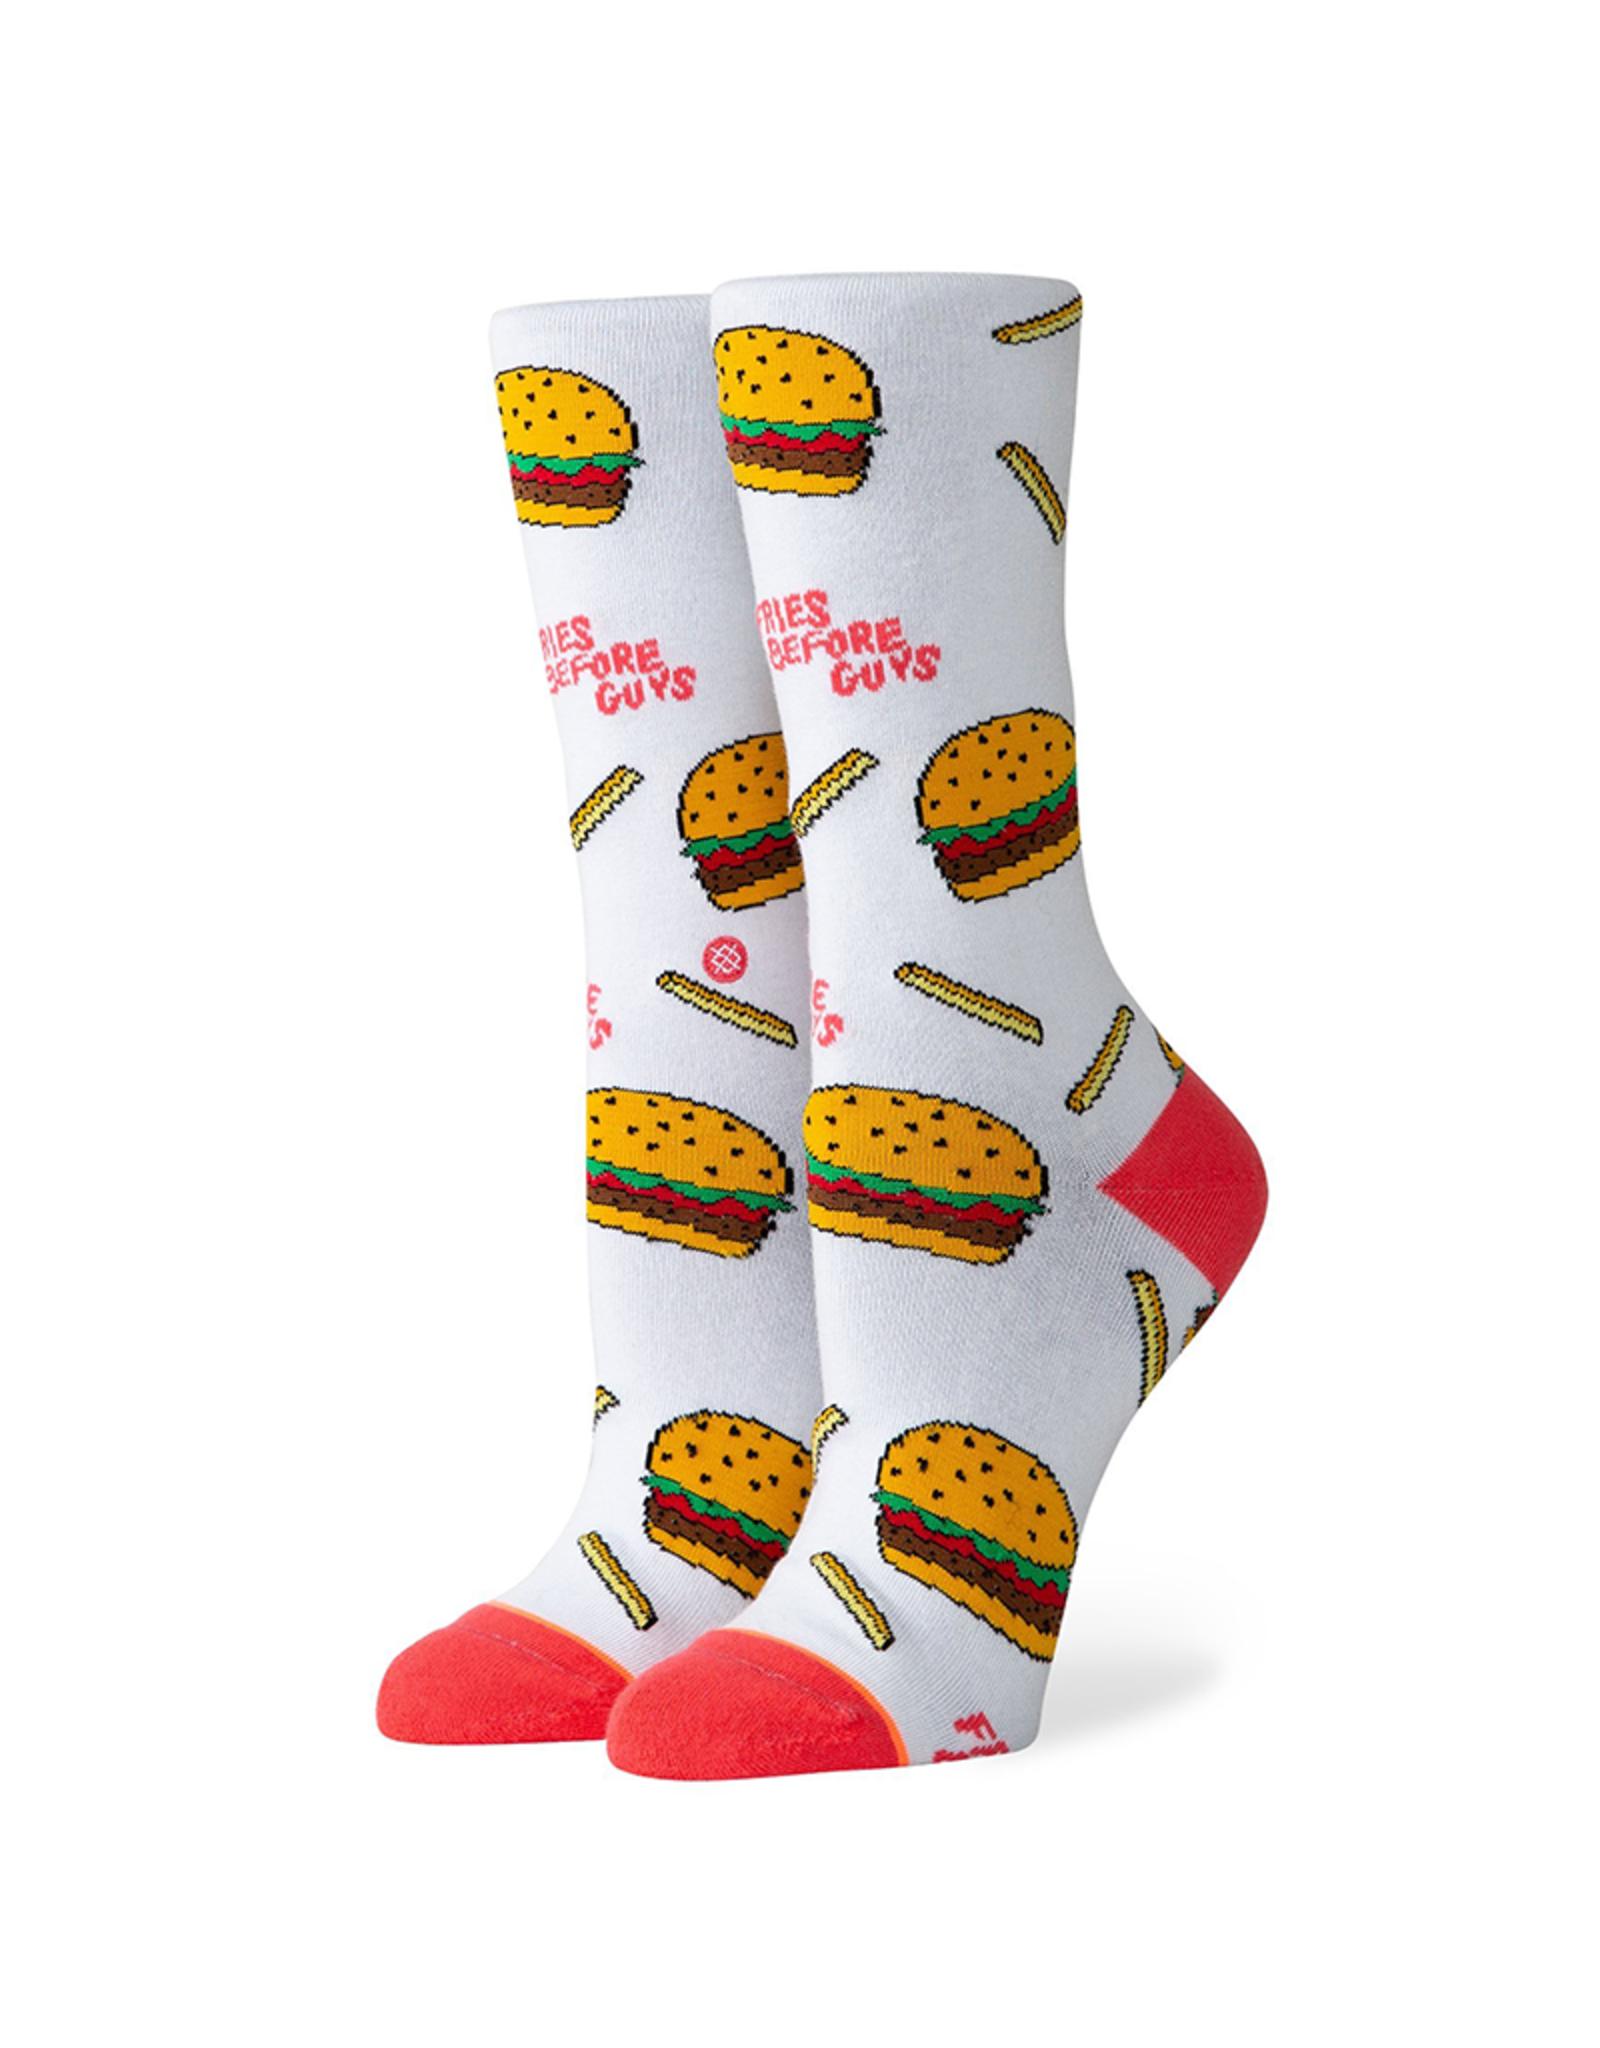 STANCE - Fries B4 Guys Socks